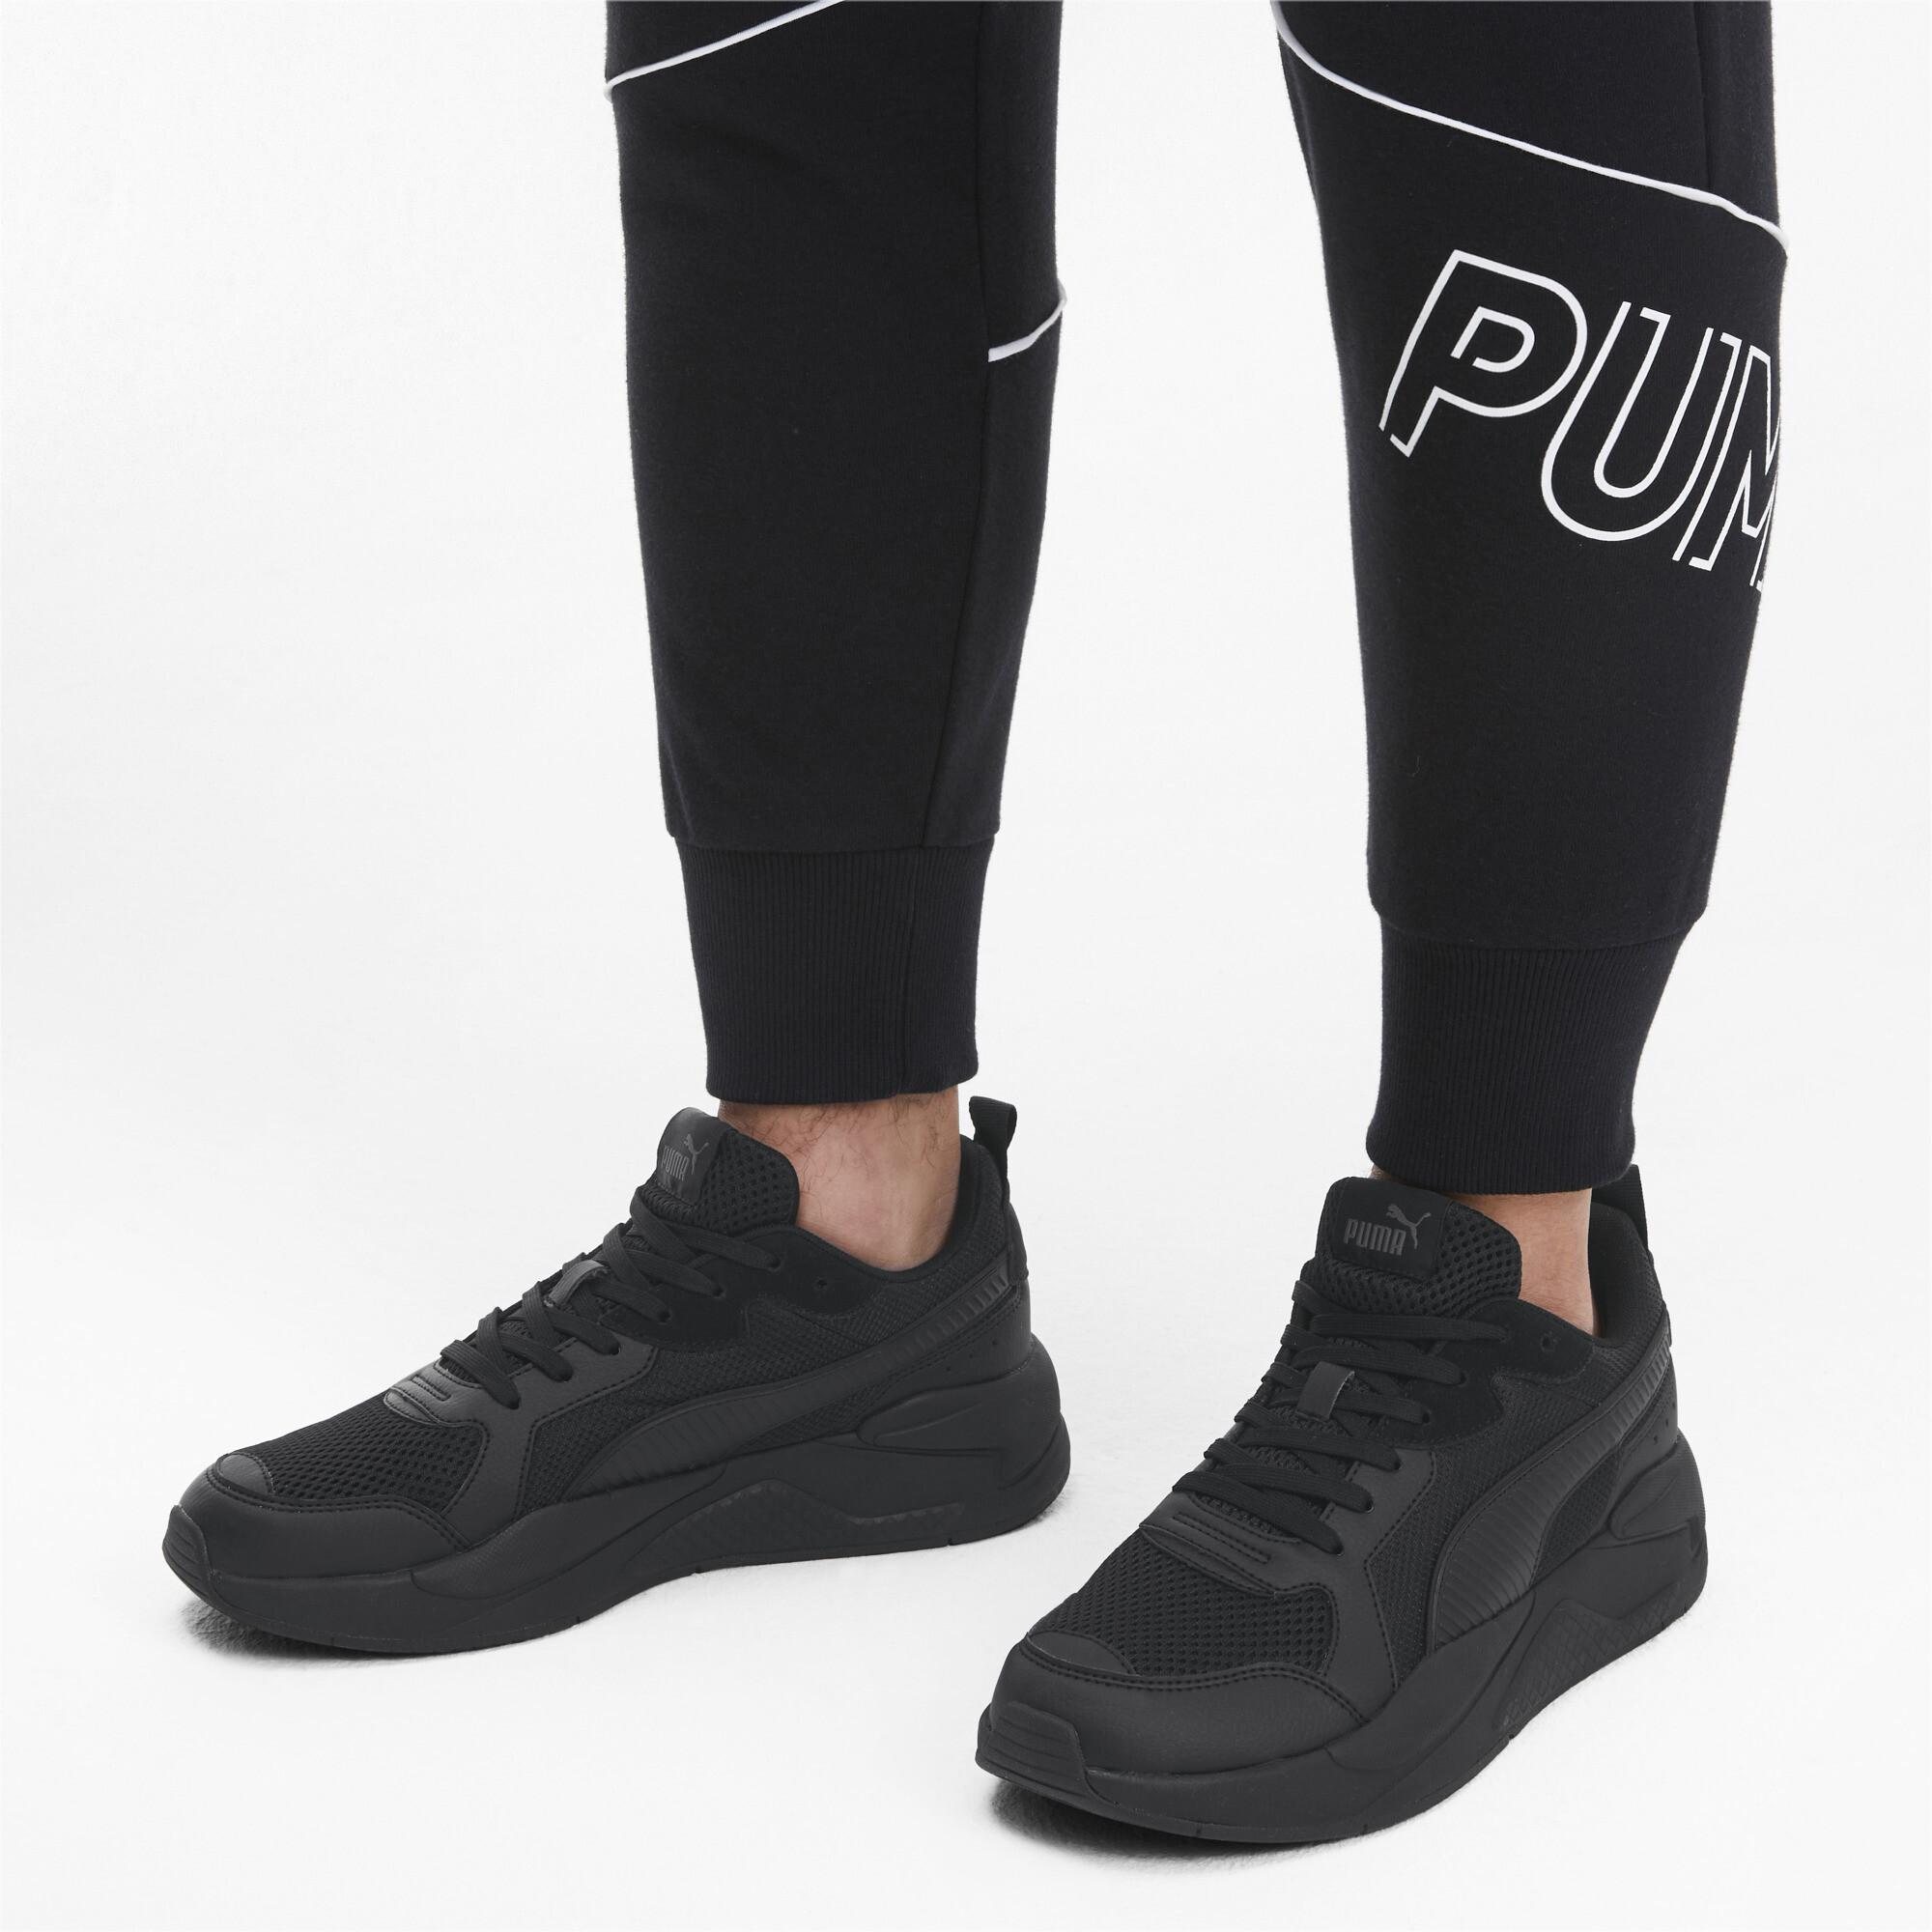 PUMA-Men-039-s-X-RAY-Sneakers thumbnail 19